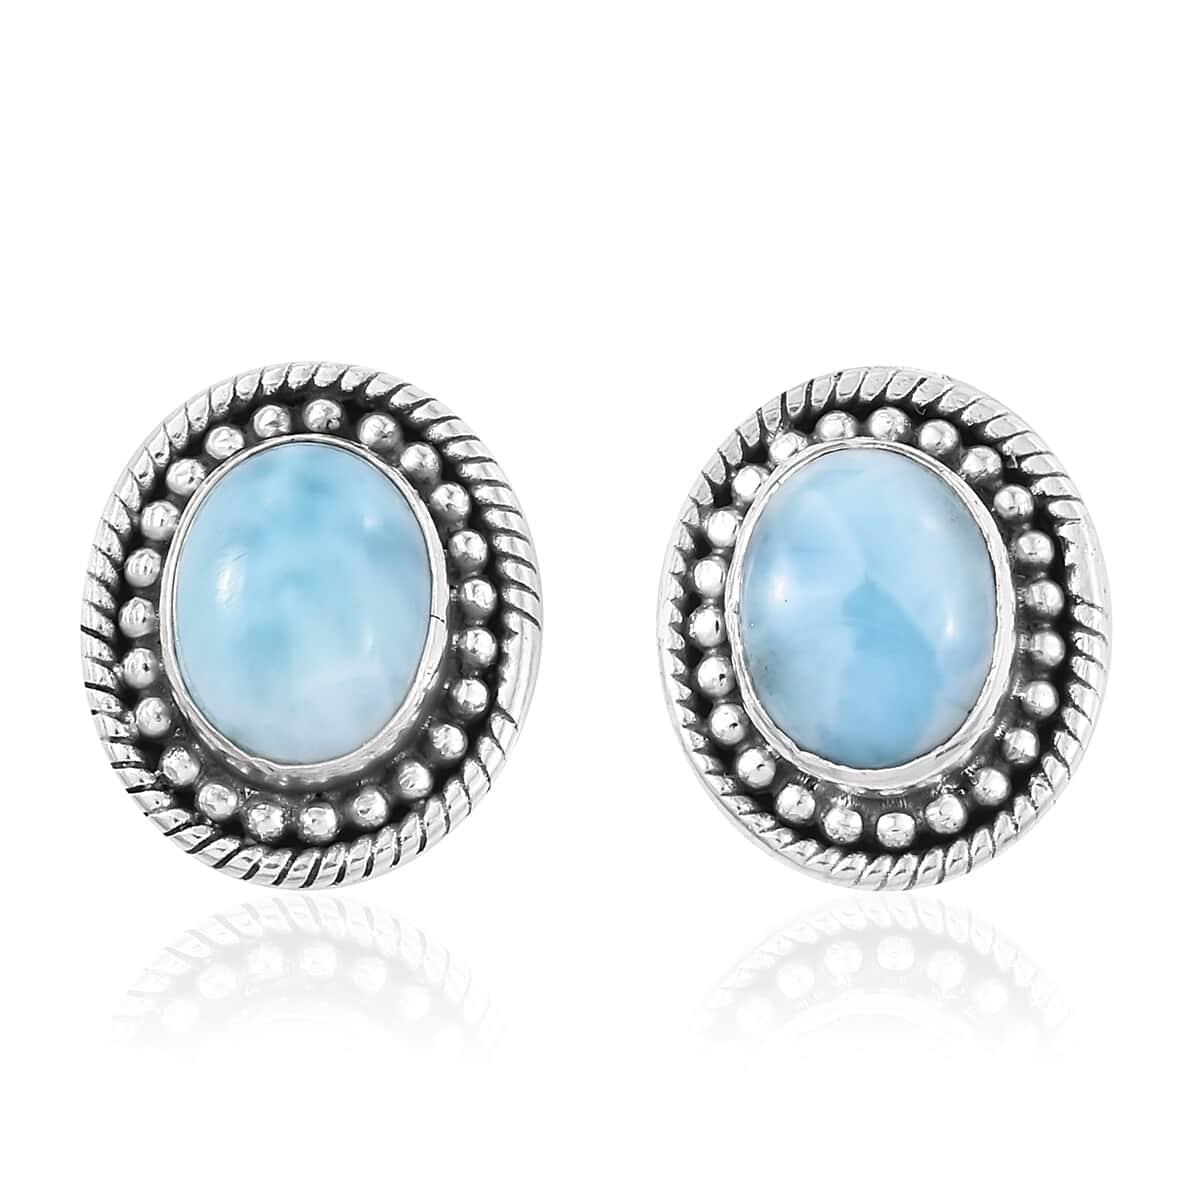 47e6b2e2a Larimar Sterling Silver Halo Stud Earrings TGW 3.95 cts. | Shop LC